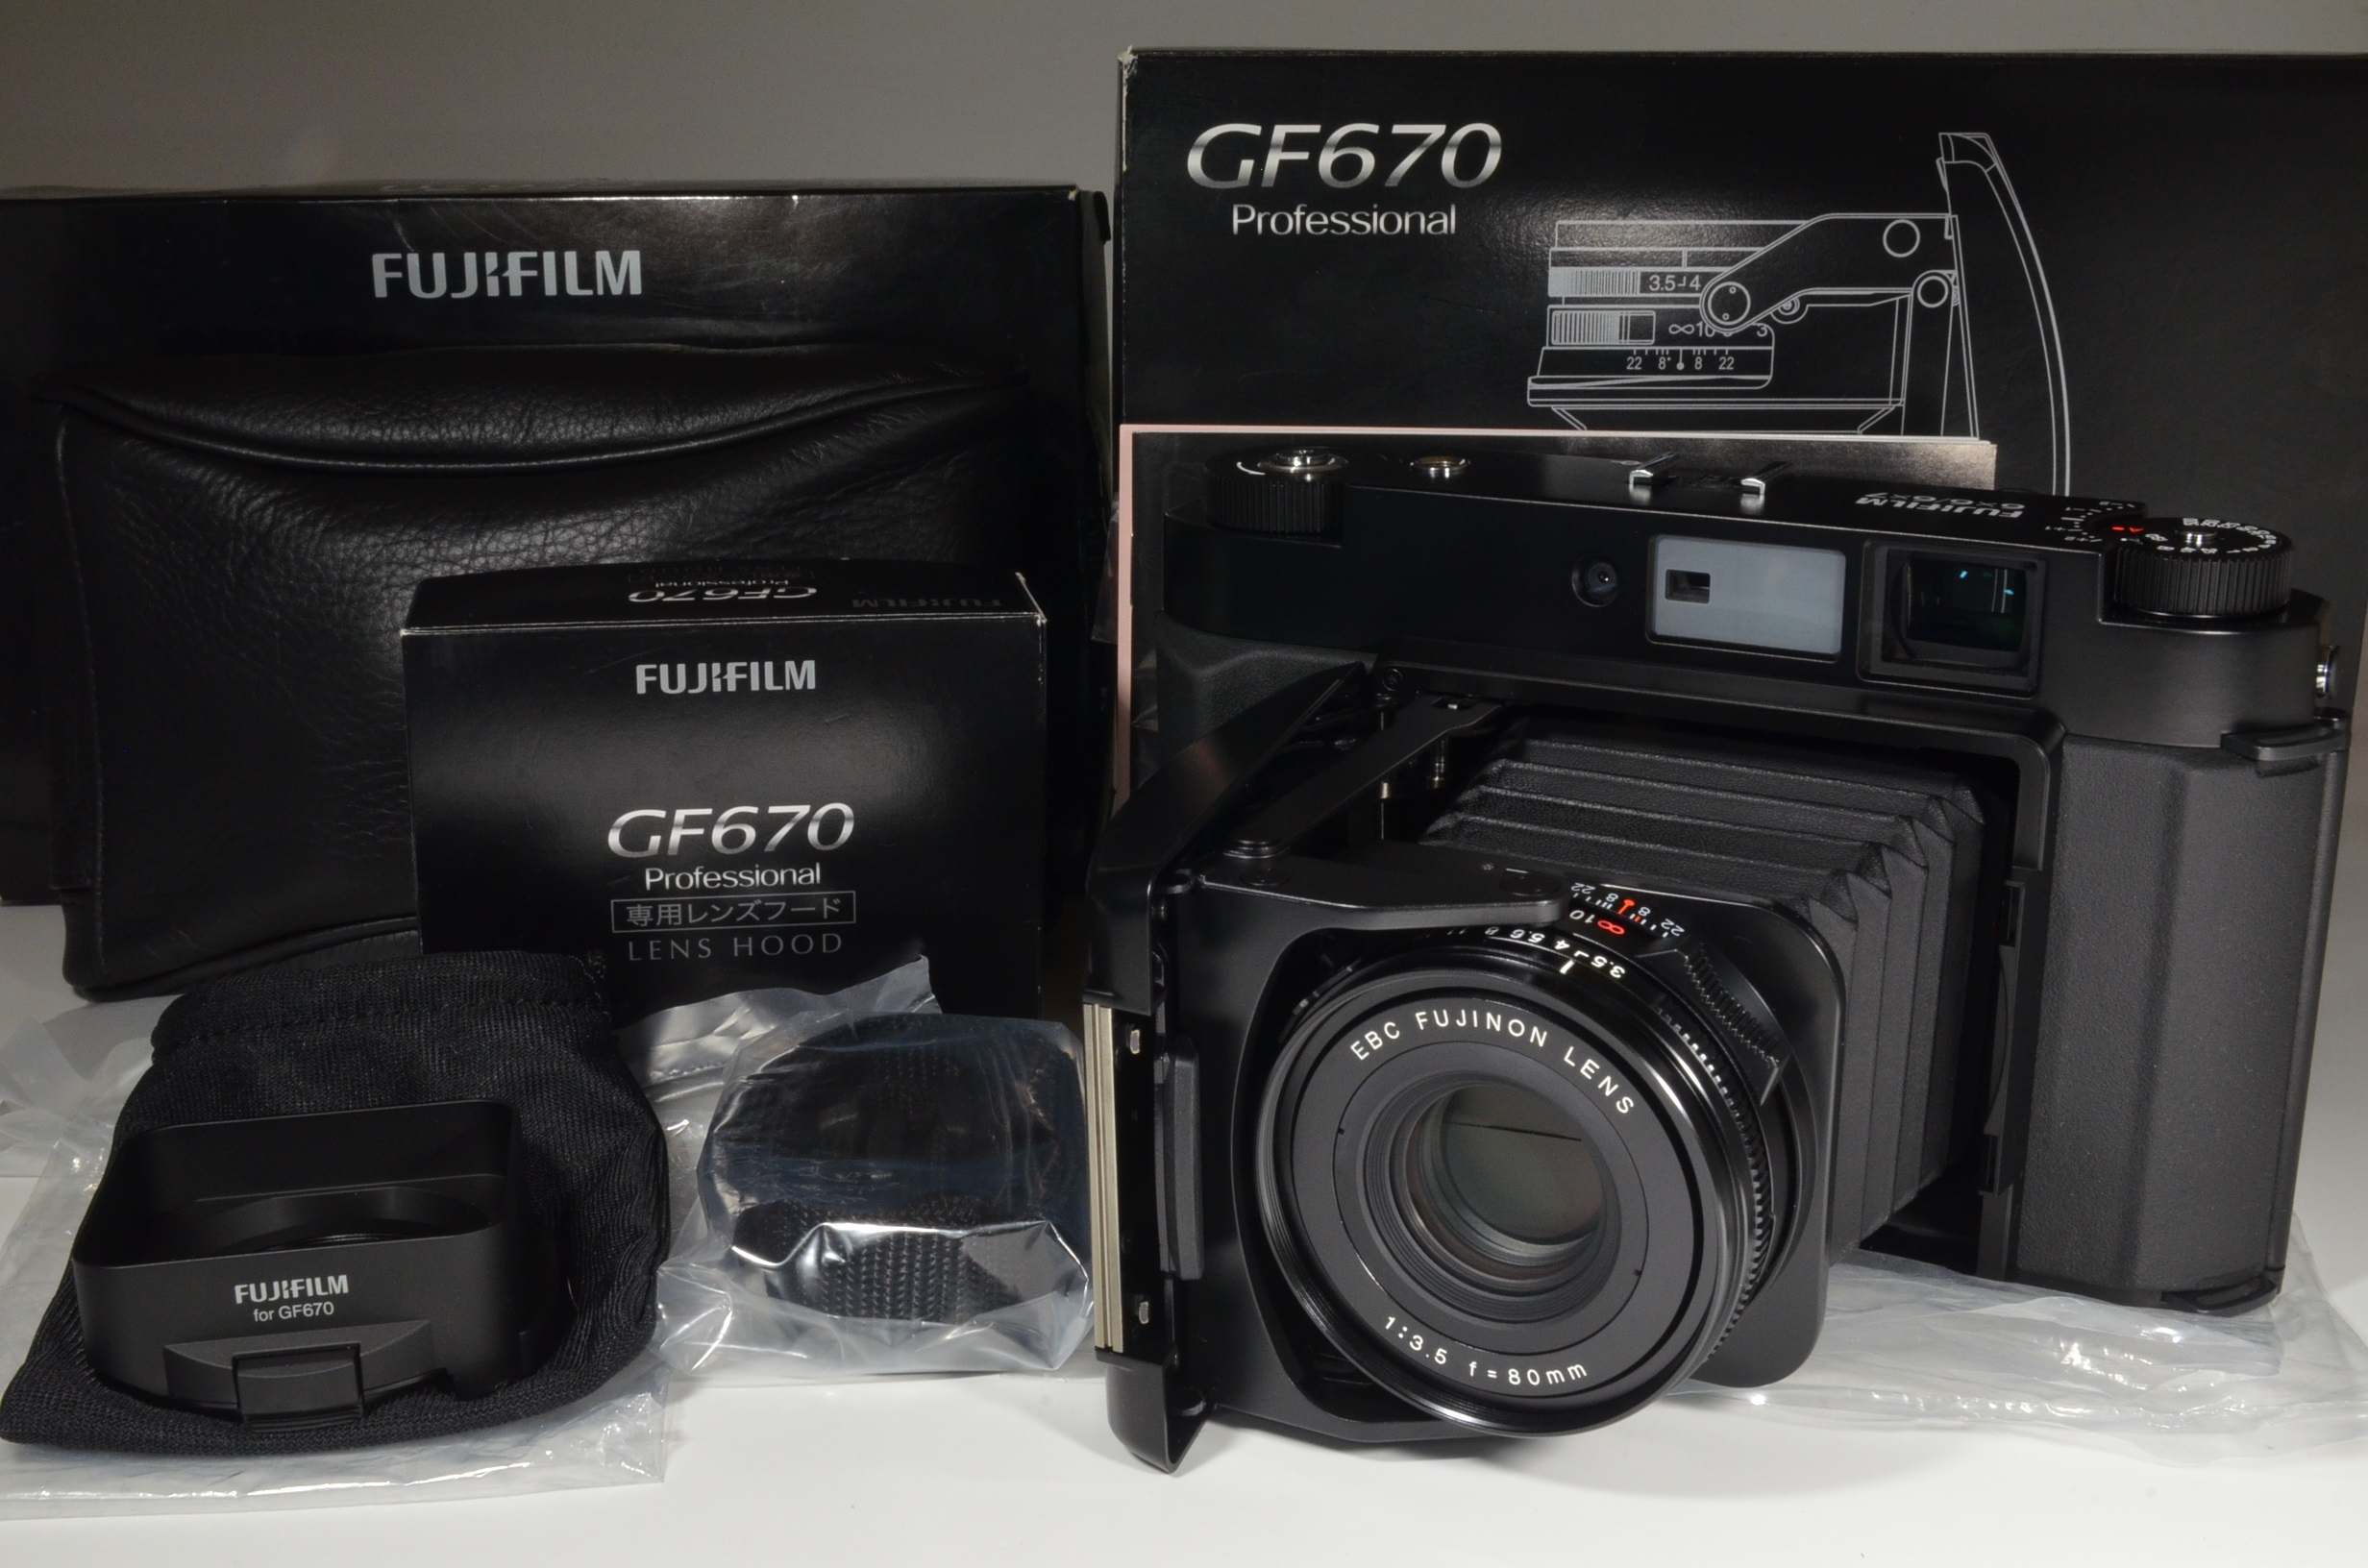 fujifilm gf670 professional black fujinon 80mm f3.5